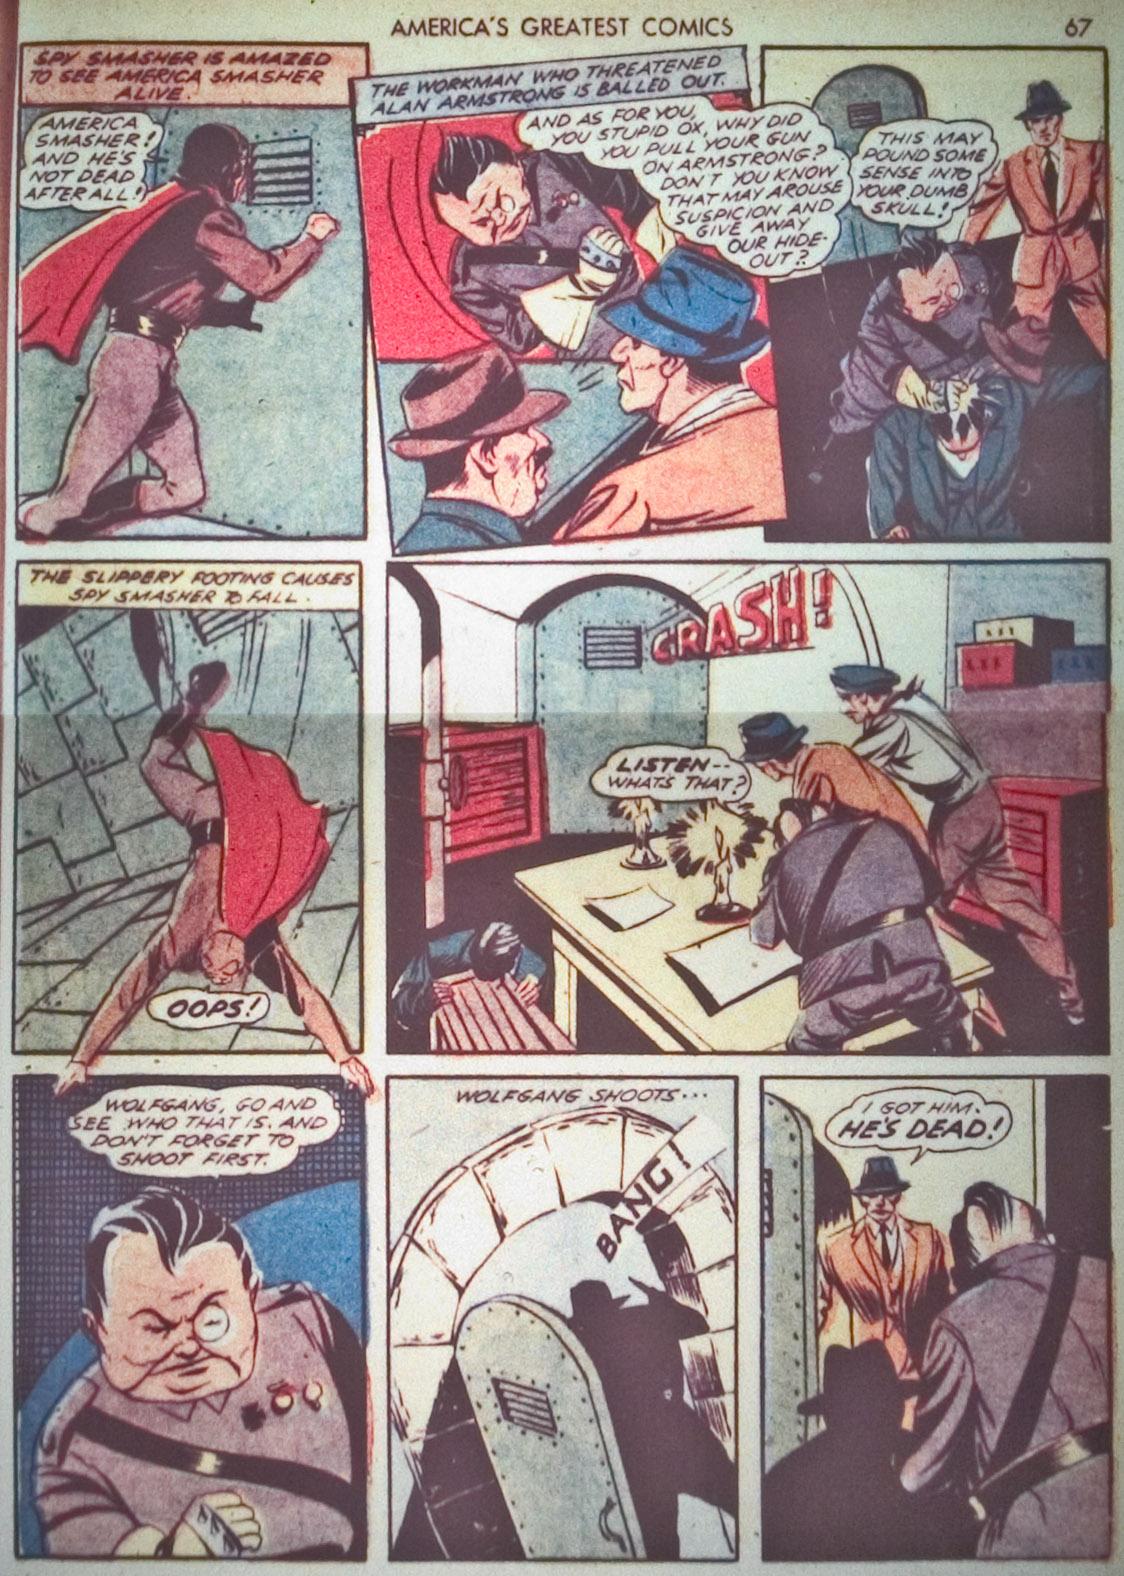 Read online America's Greatest Comics comic -  Issue #1 - 70